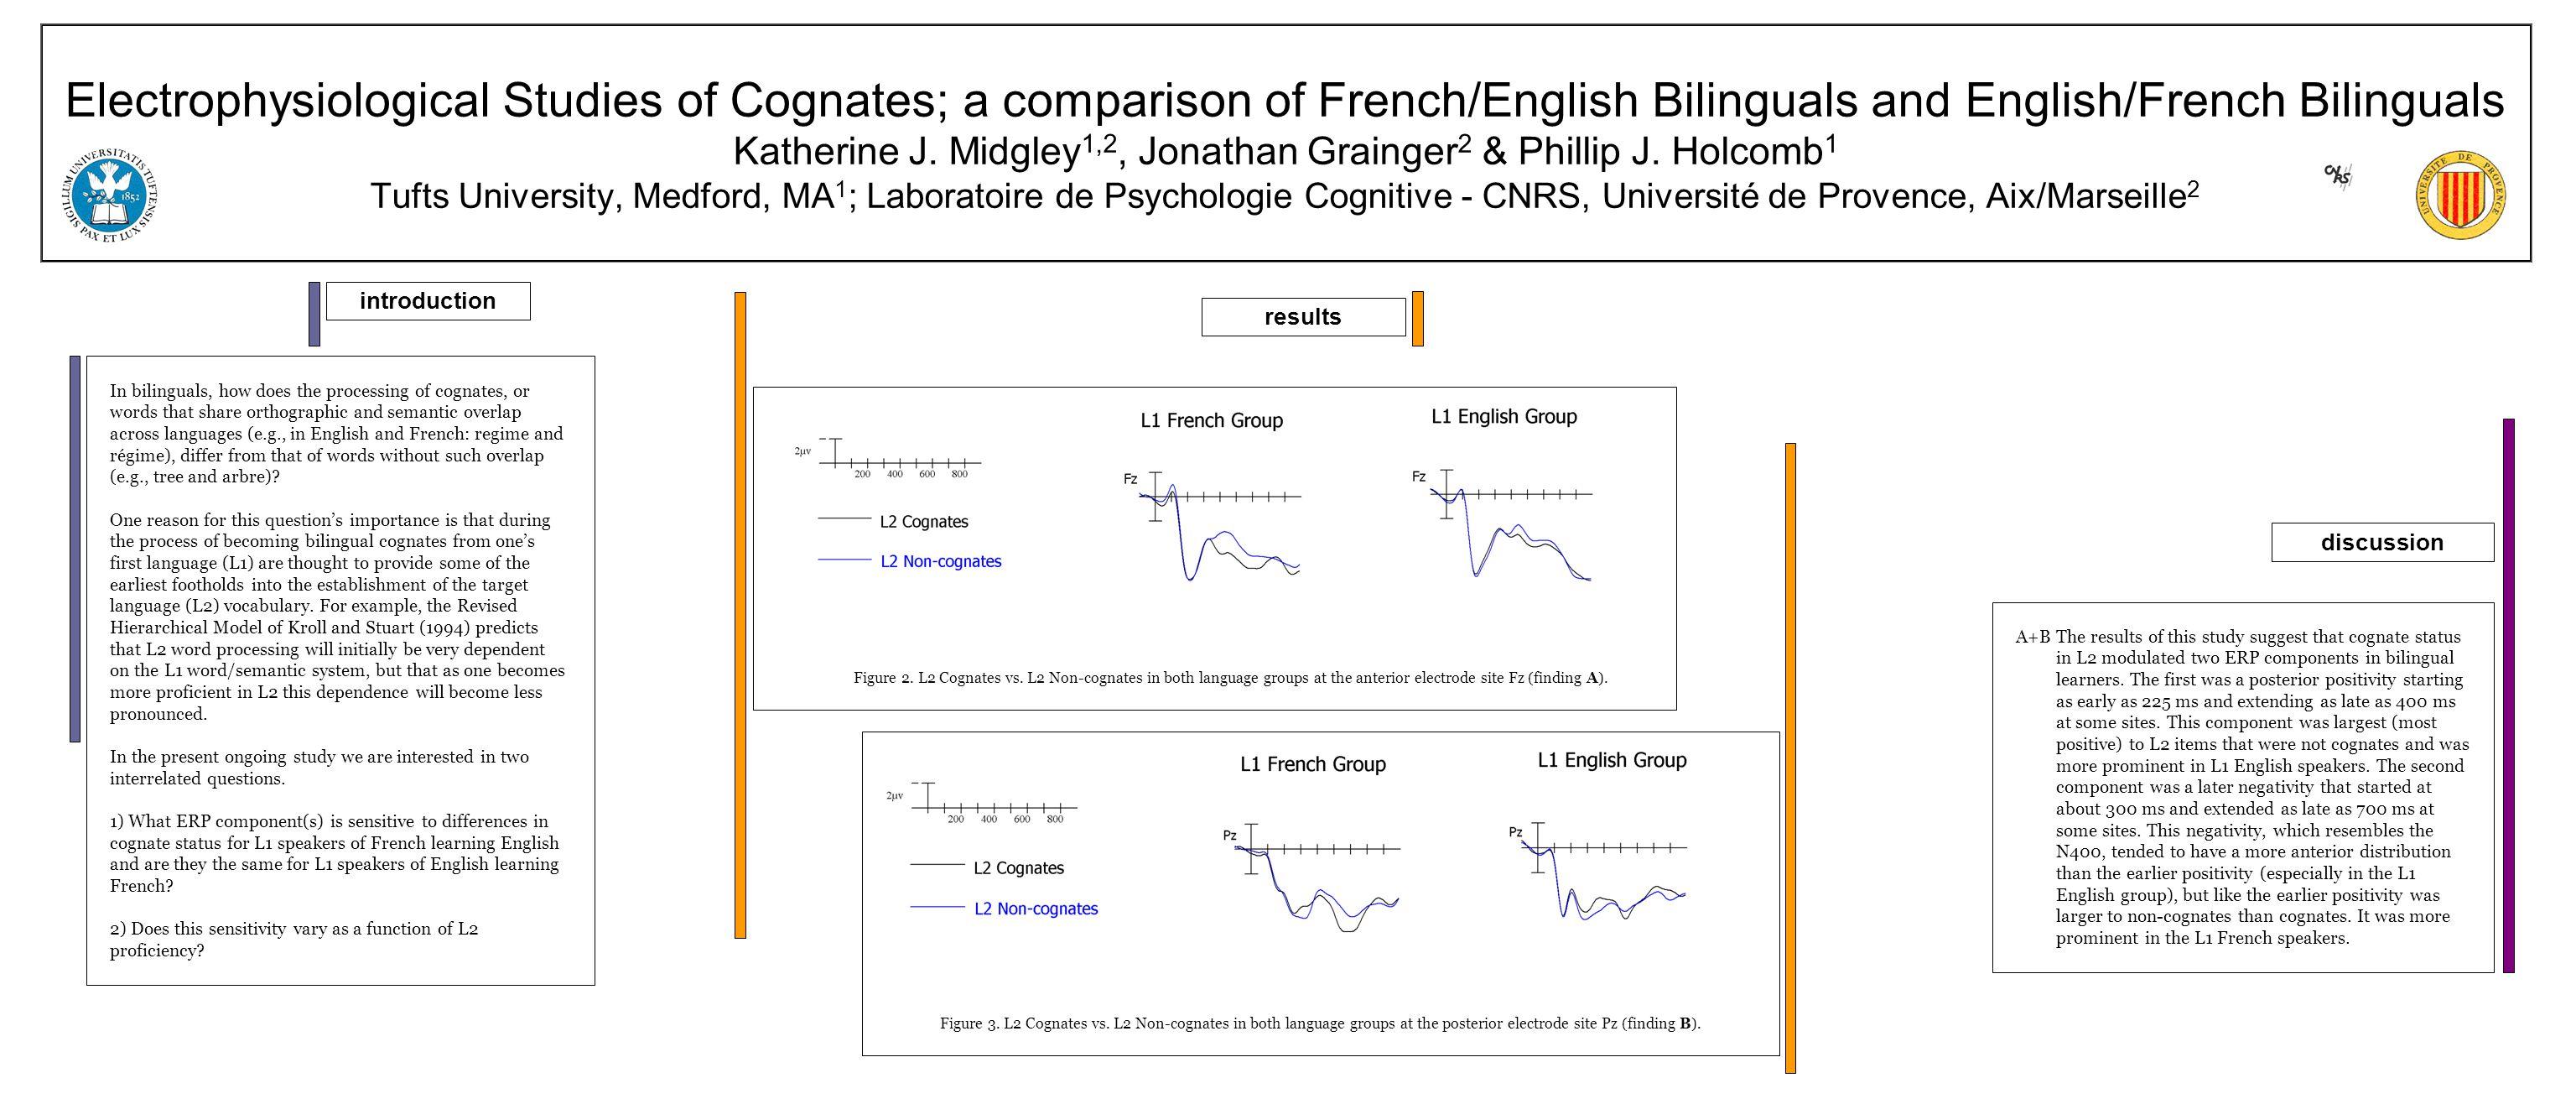 Figure 2. L2 Cognates vs. L2 Non-cognates in both language groups at the anterior electrode site Fz (finding A). Figure 3. L2 Cognates vs. L2 Non-cogn